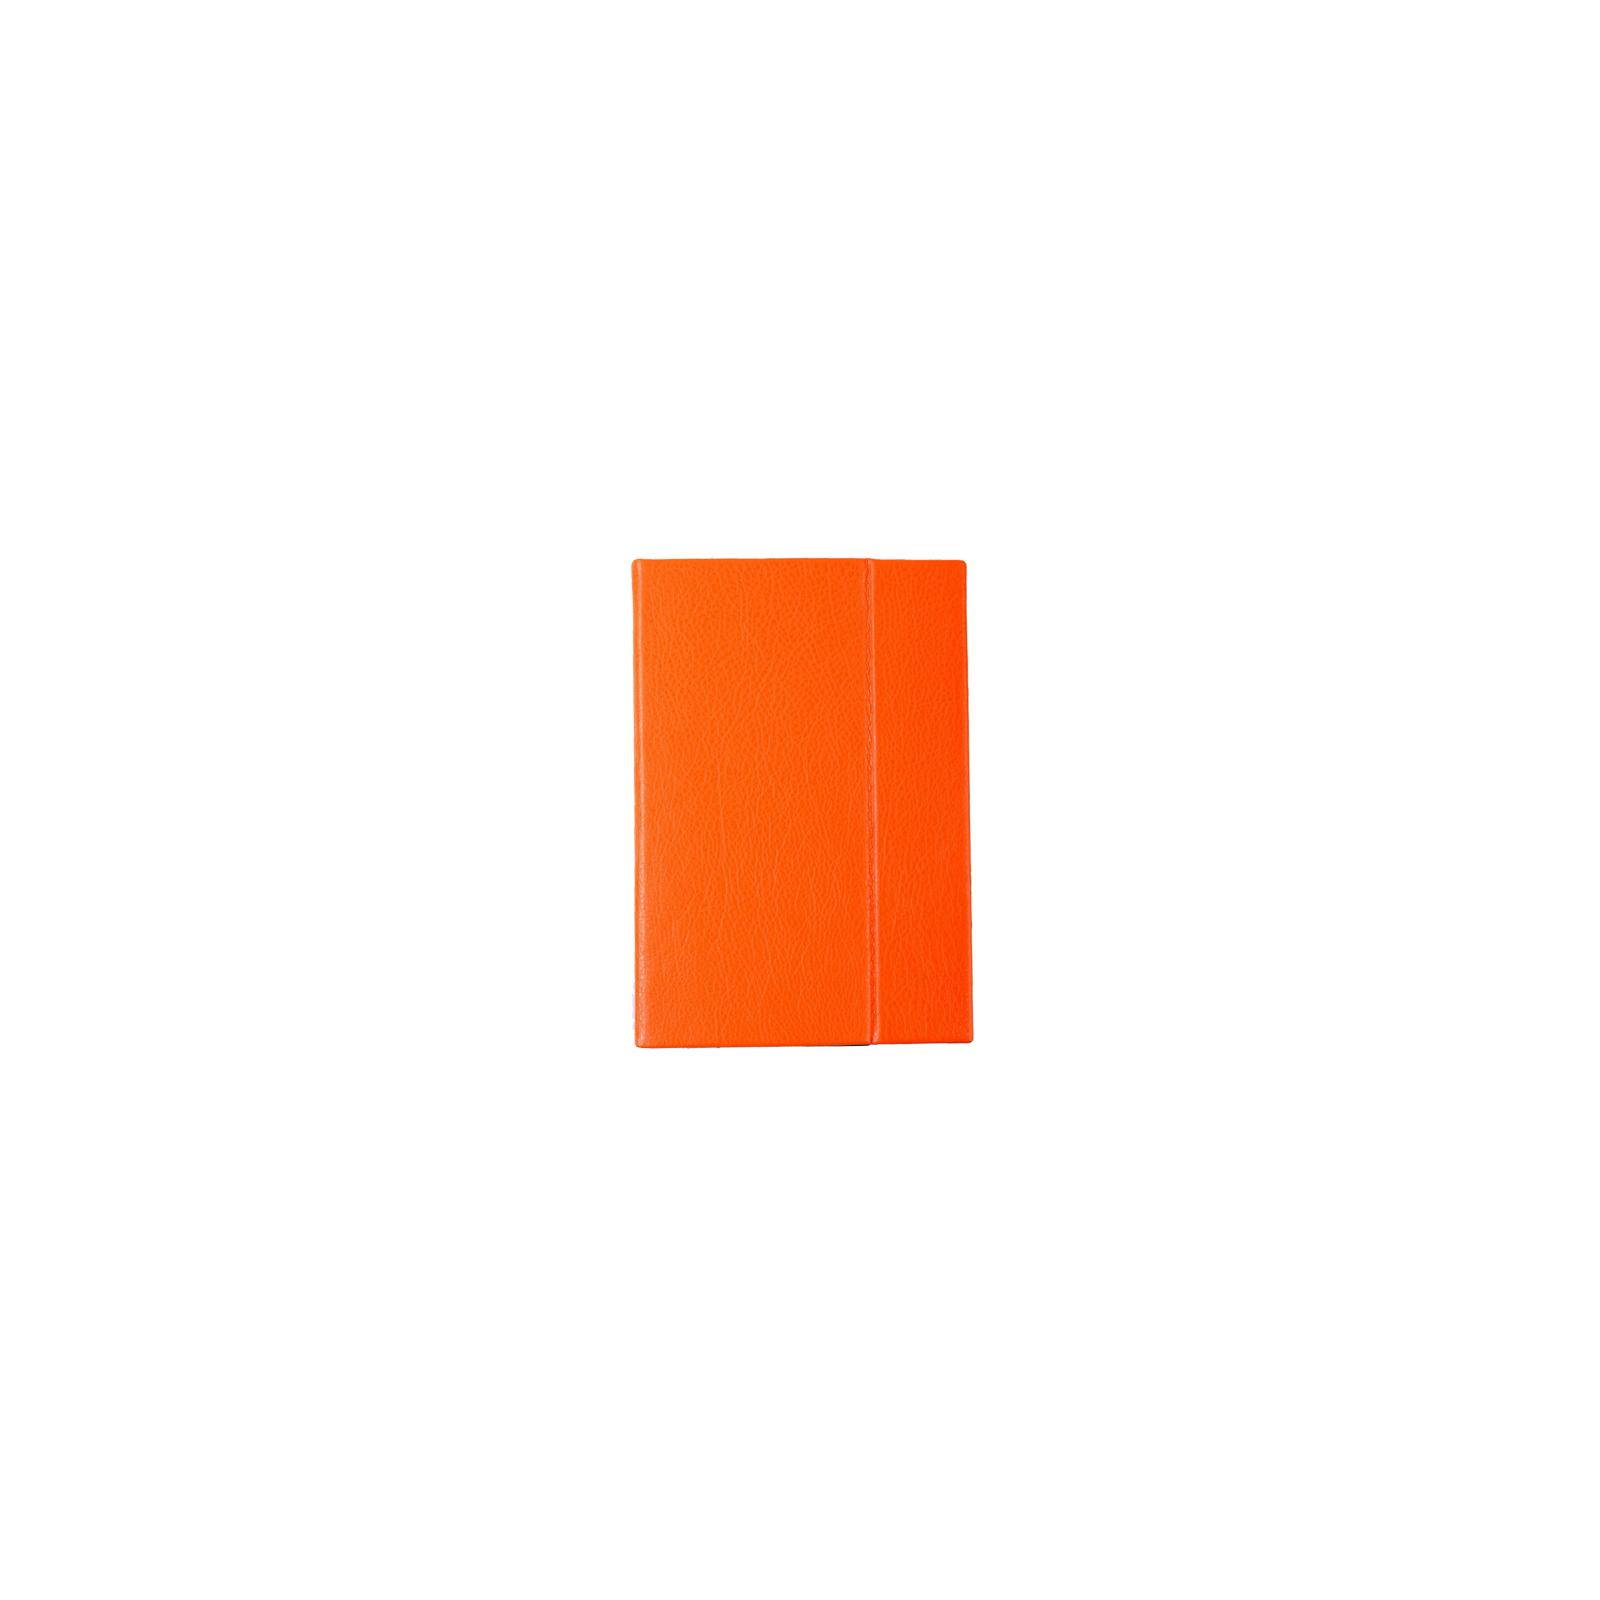 Чехол для планшета Vento 9 Desire Bright - orange изображение 2